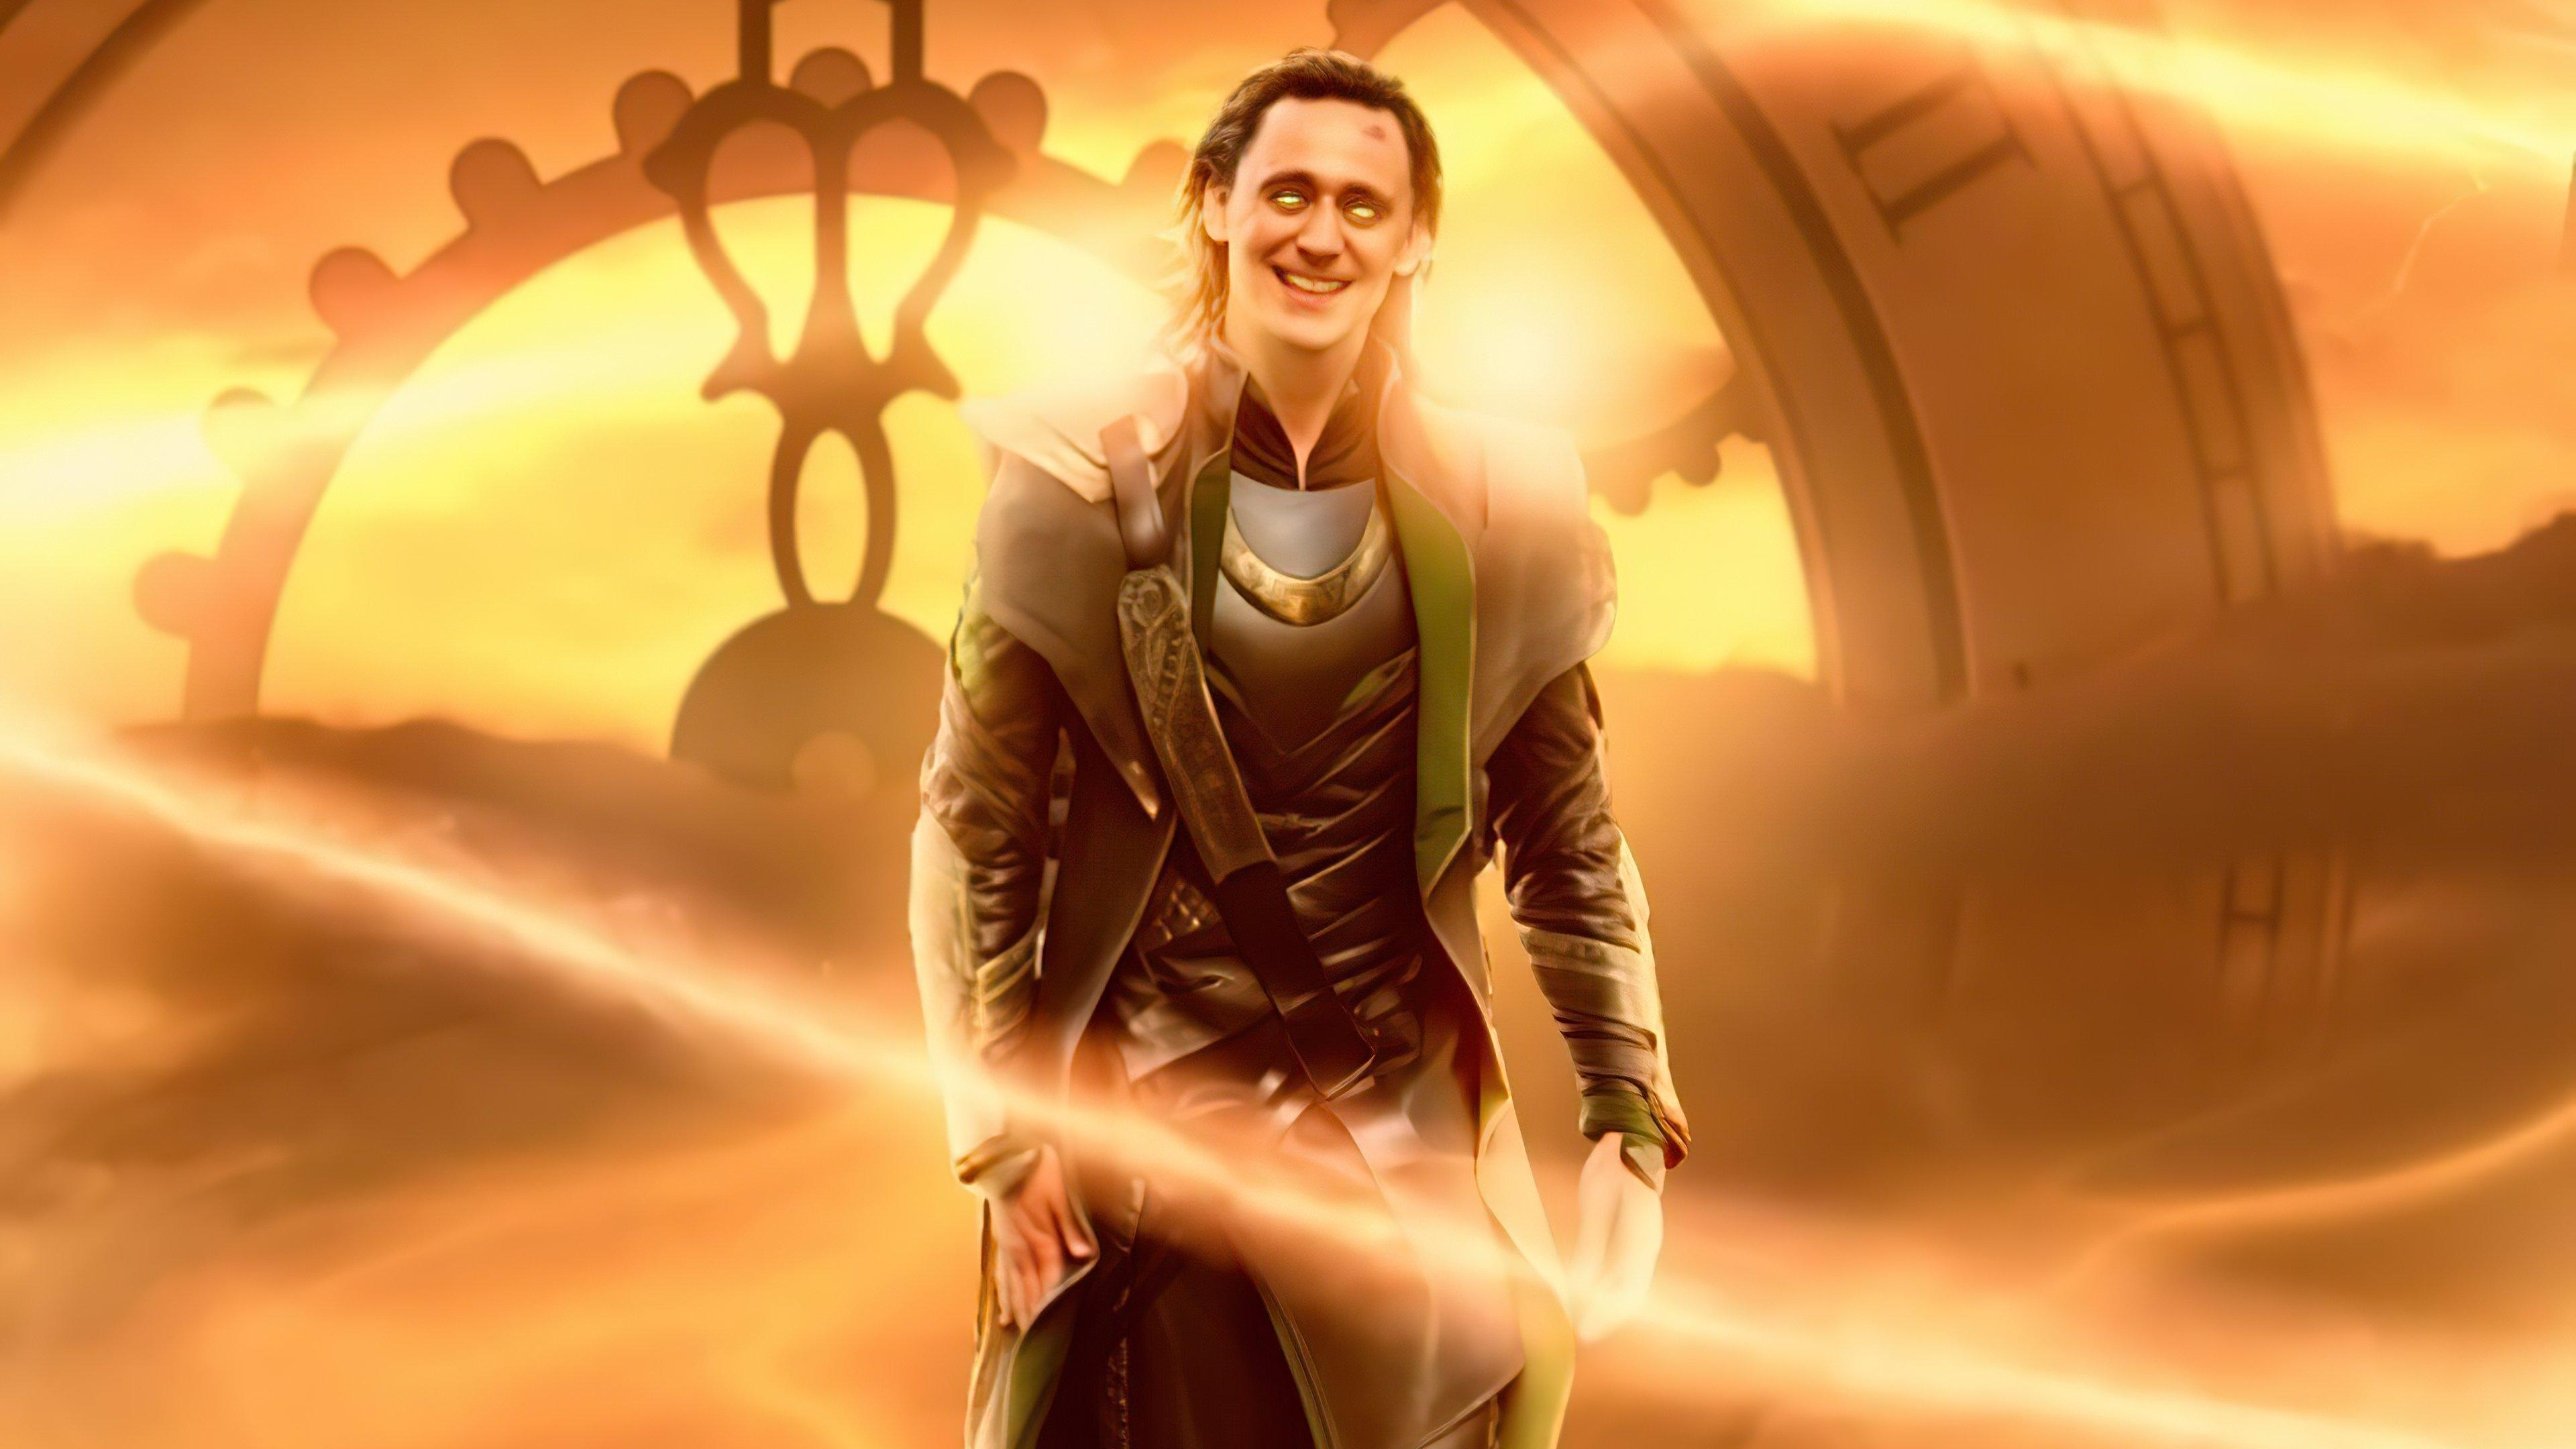 Wallpaper Loki The God of mischief Poster